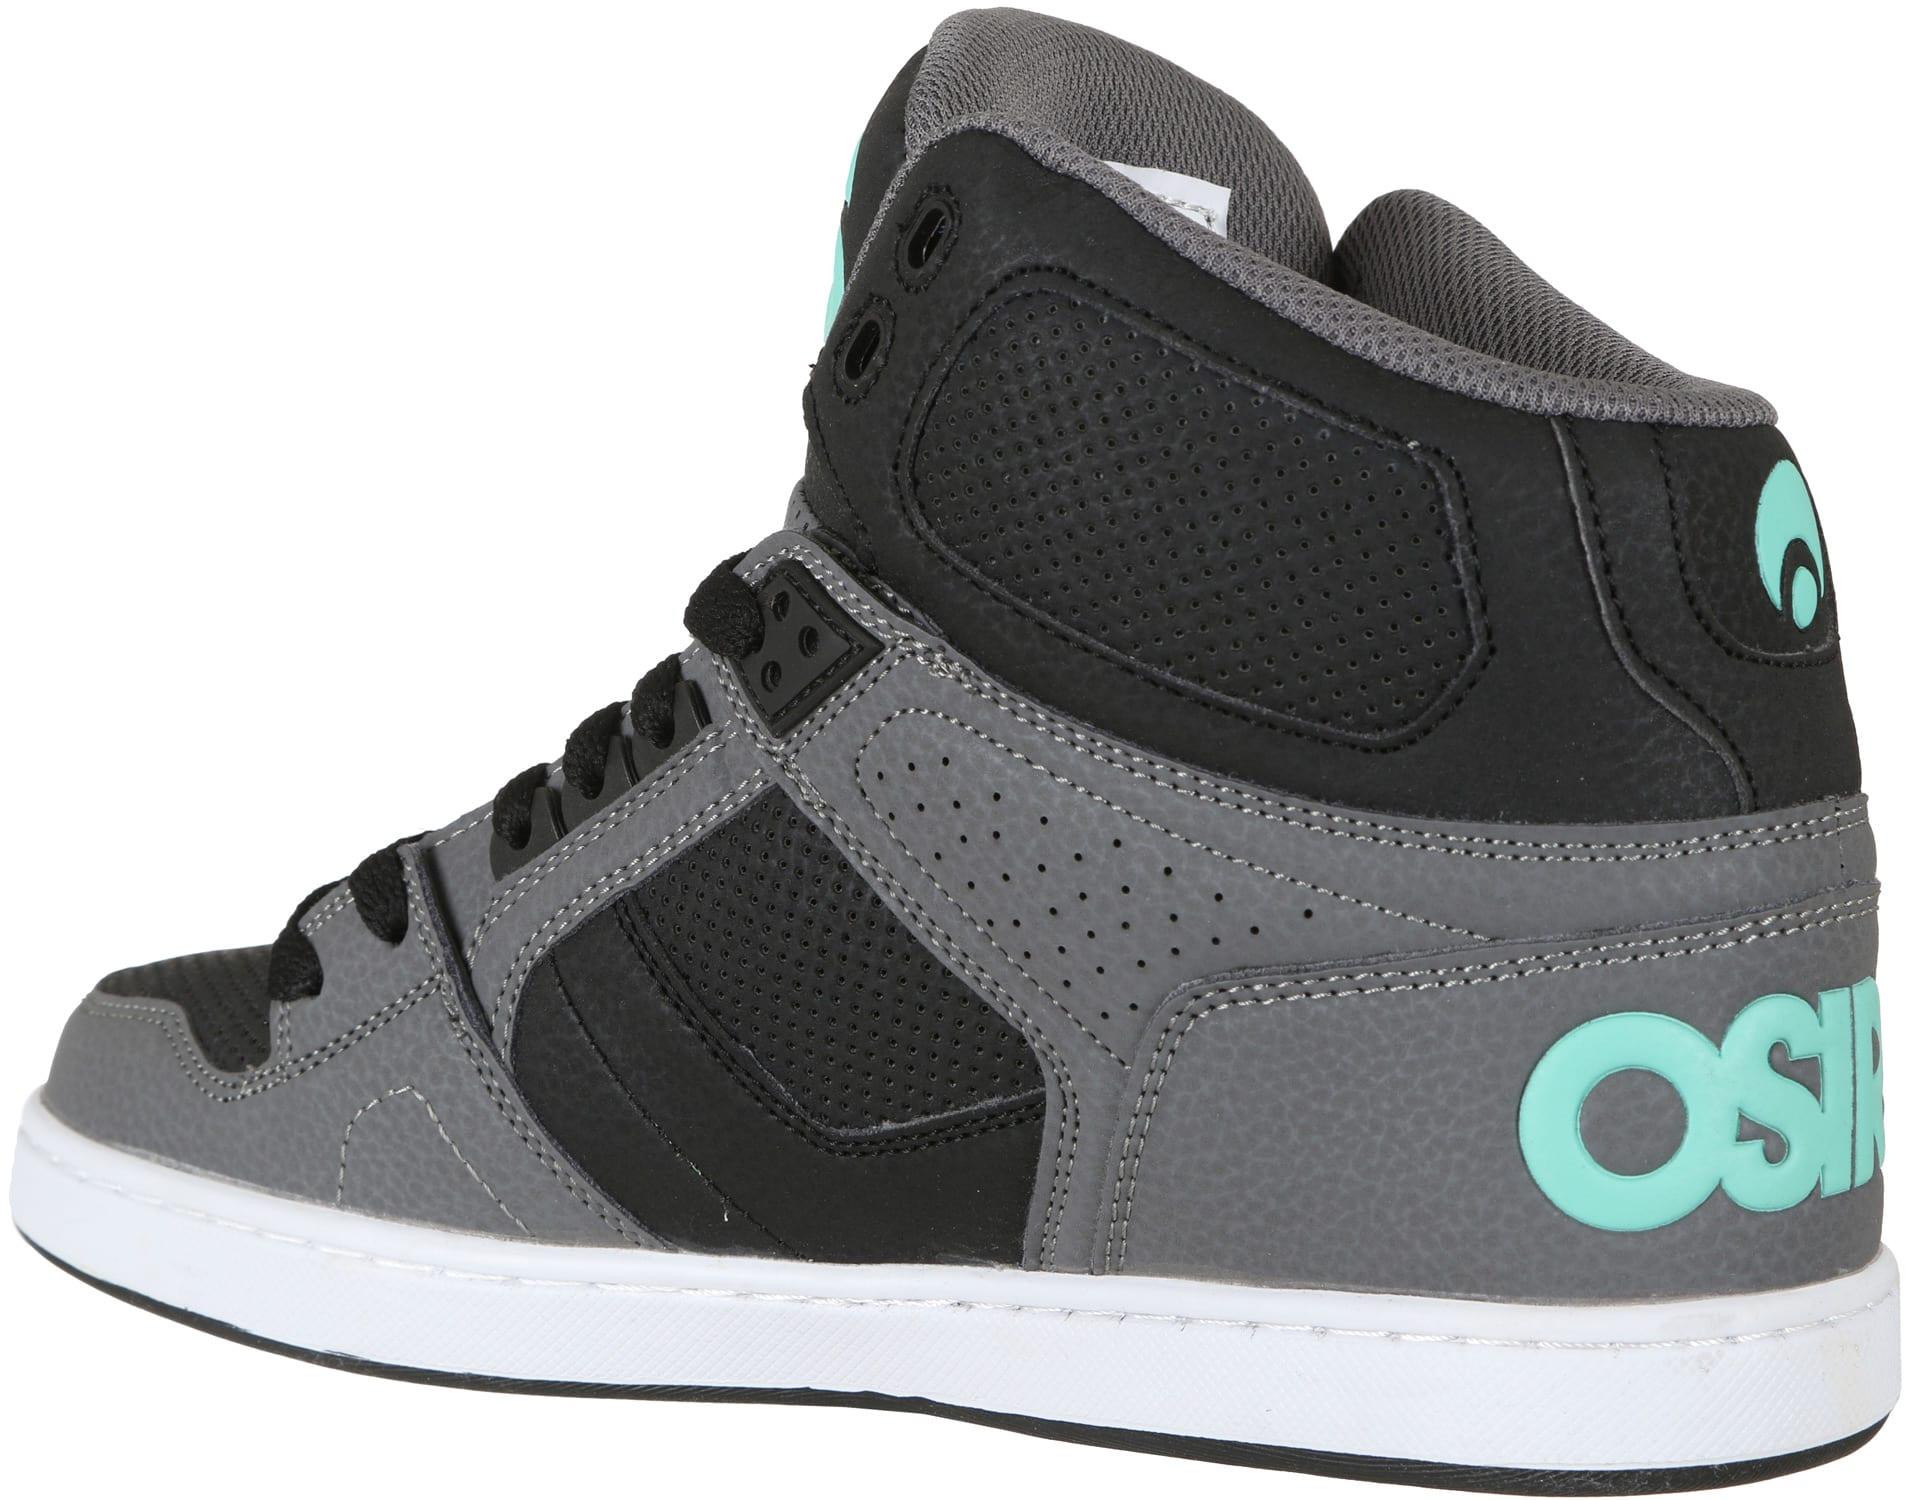 b1451a25299 Osiris NYC 83 CLK Skate Shoes - thumbnail 3